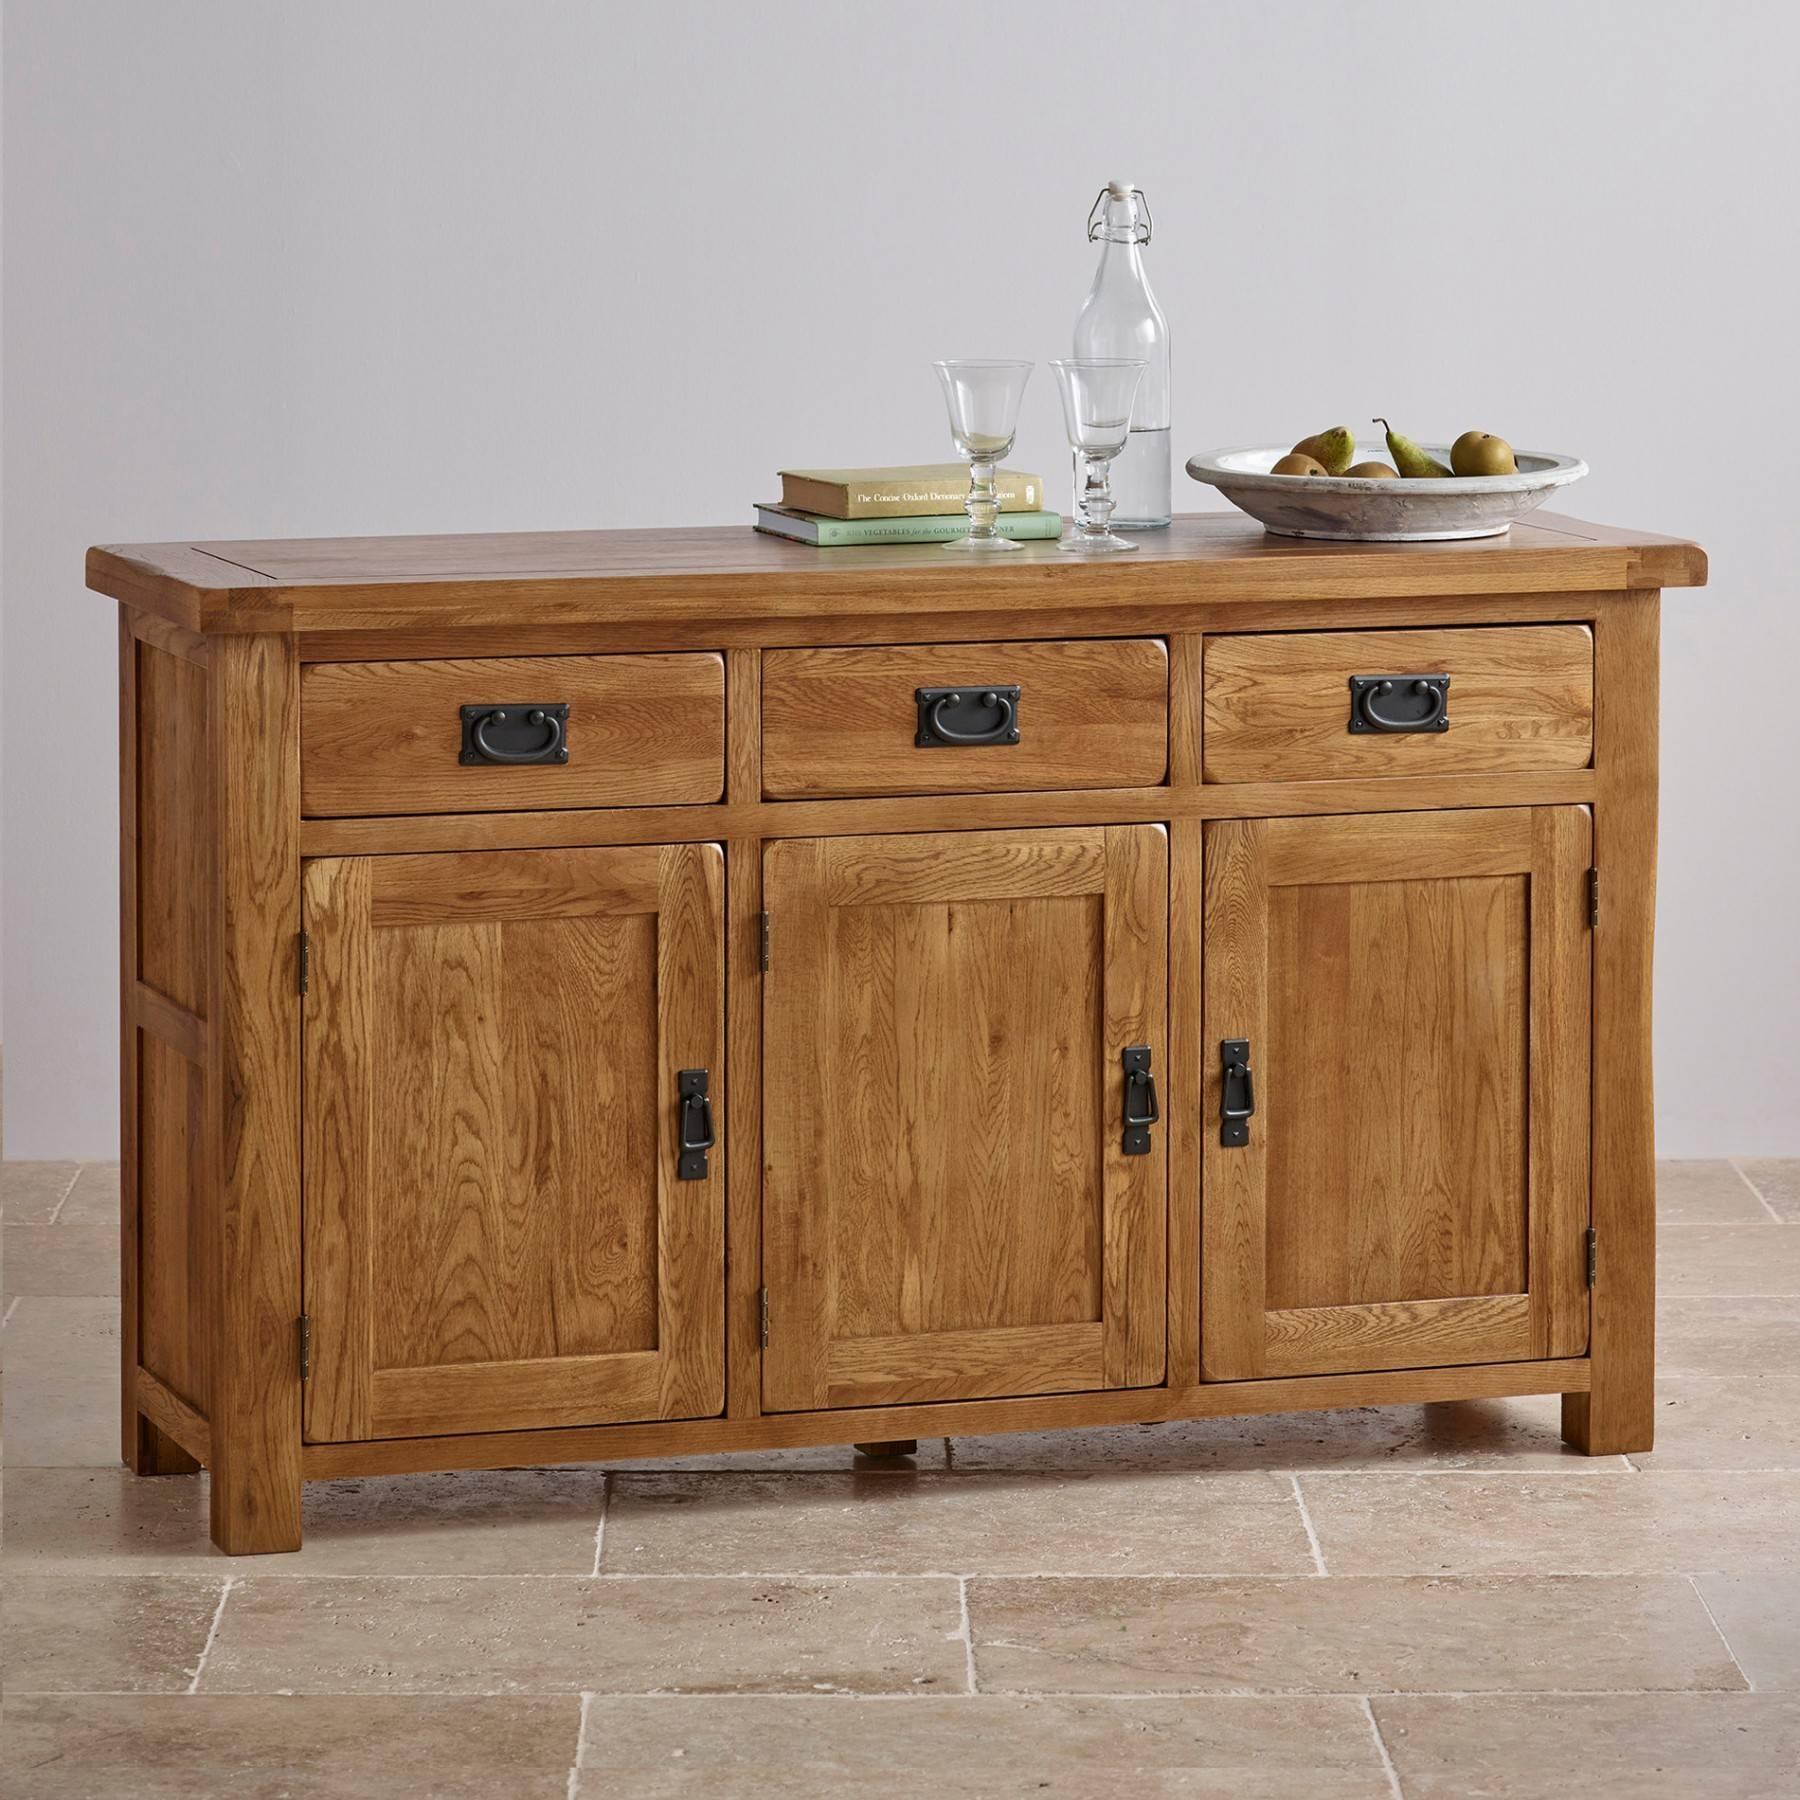 Original Rustic Solid Oak Large Sideboard | Sideboards | Dining regarding Rustic Oak Large Sideboards (Image 14 of 15)